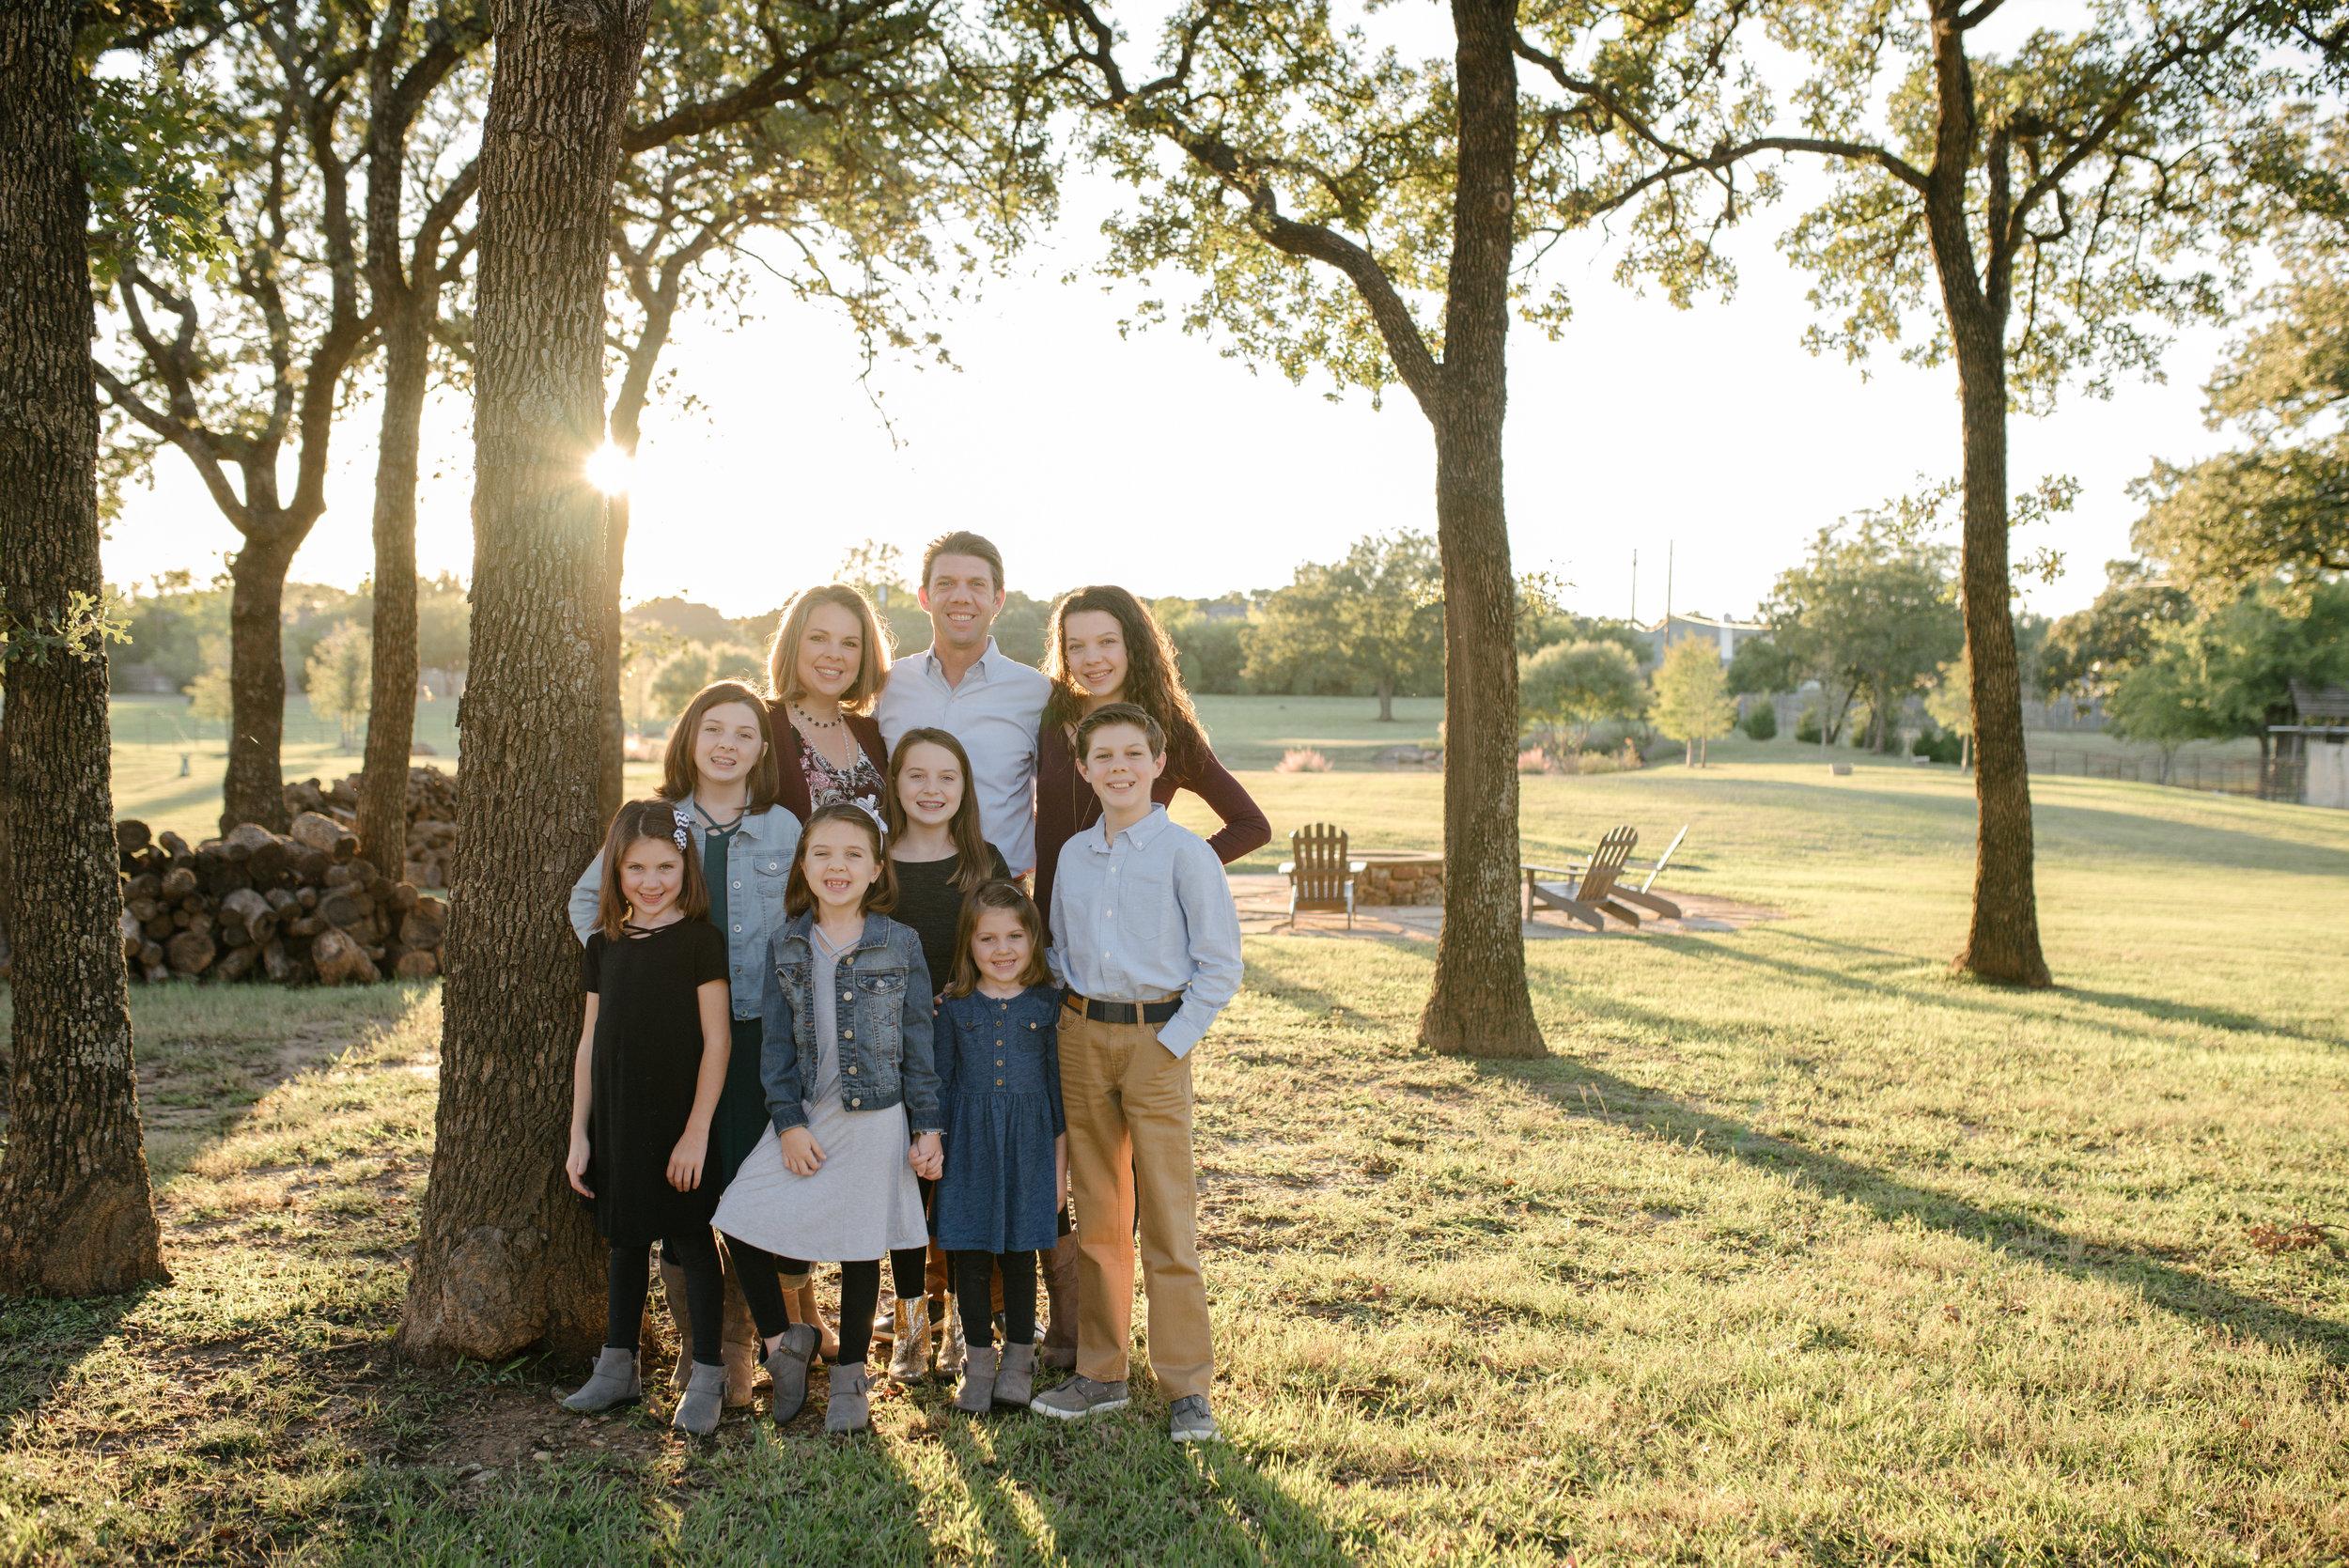 Willbanks Family 2018_jessicasheppard.com-10.jpg